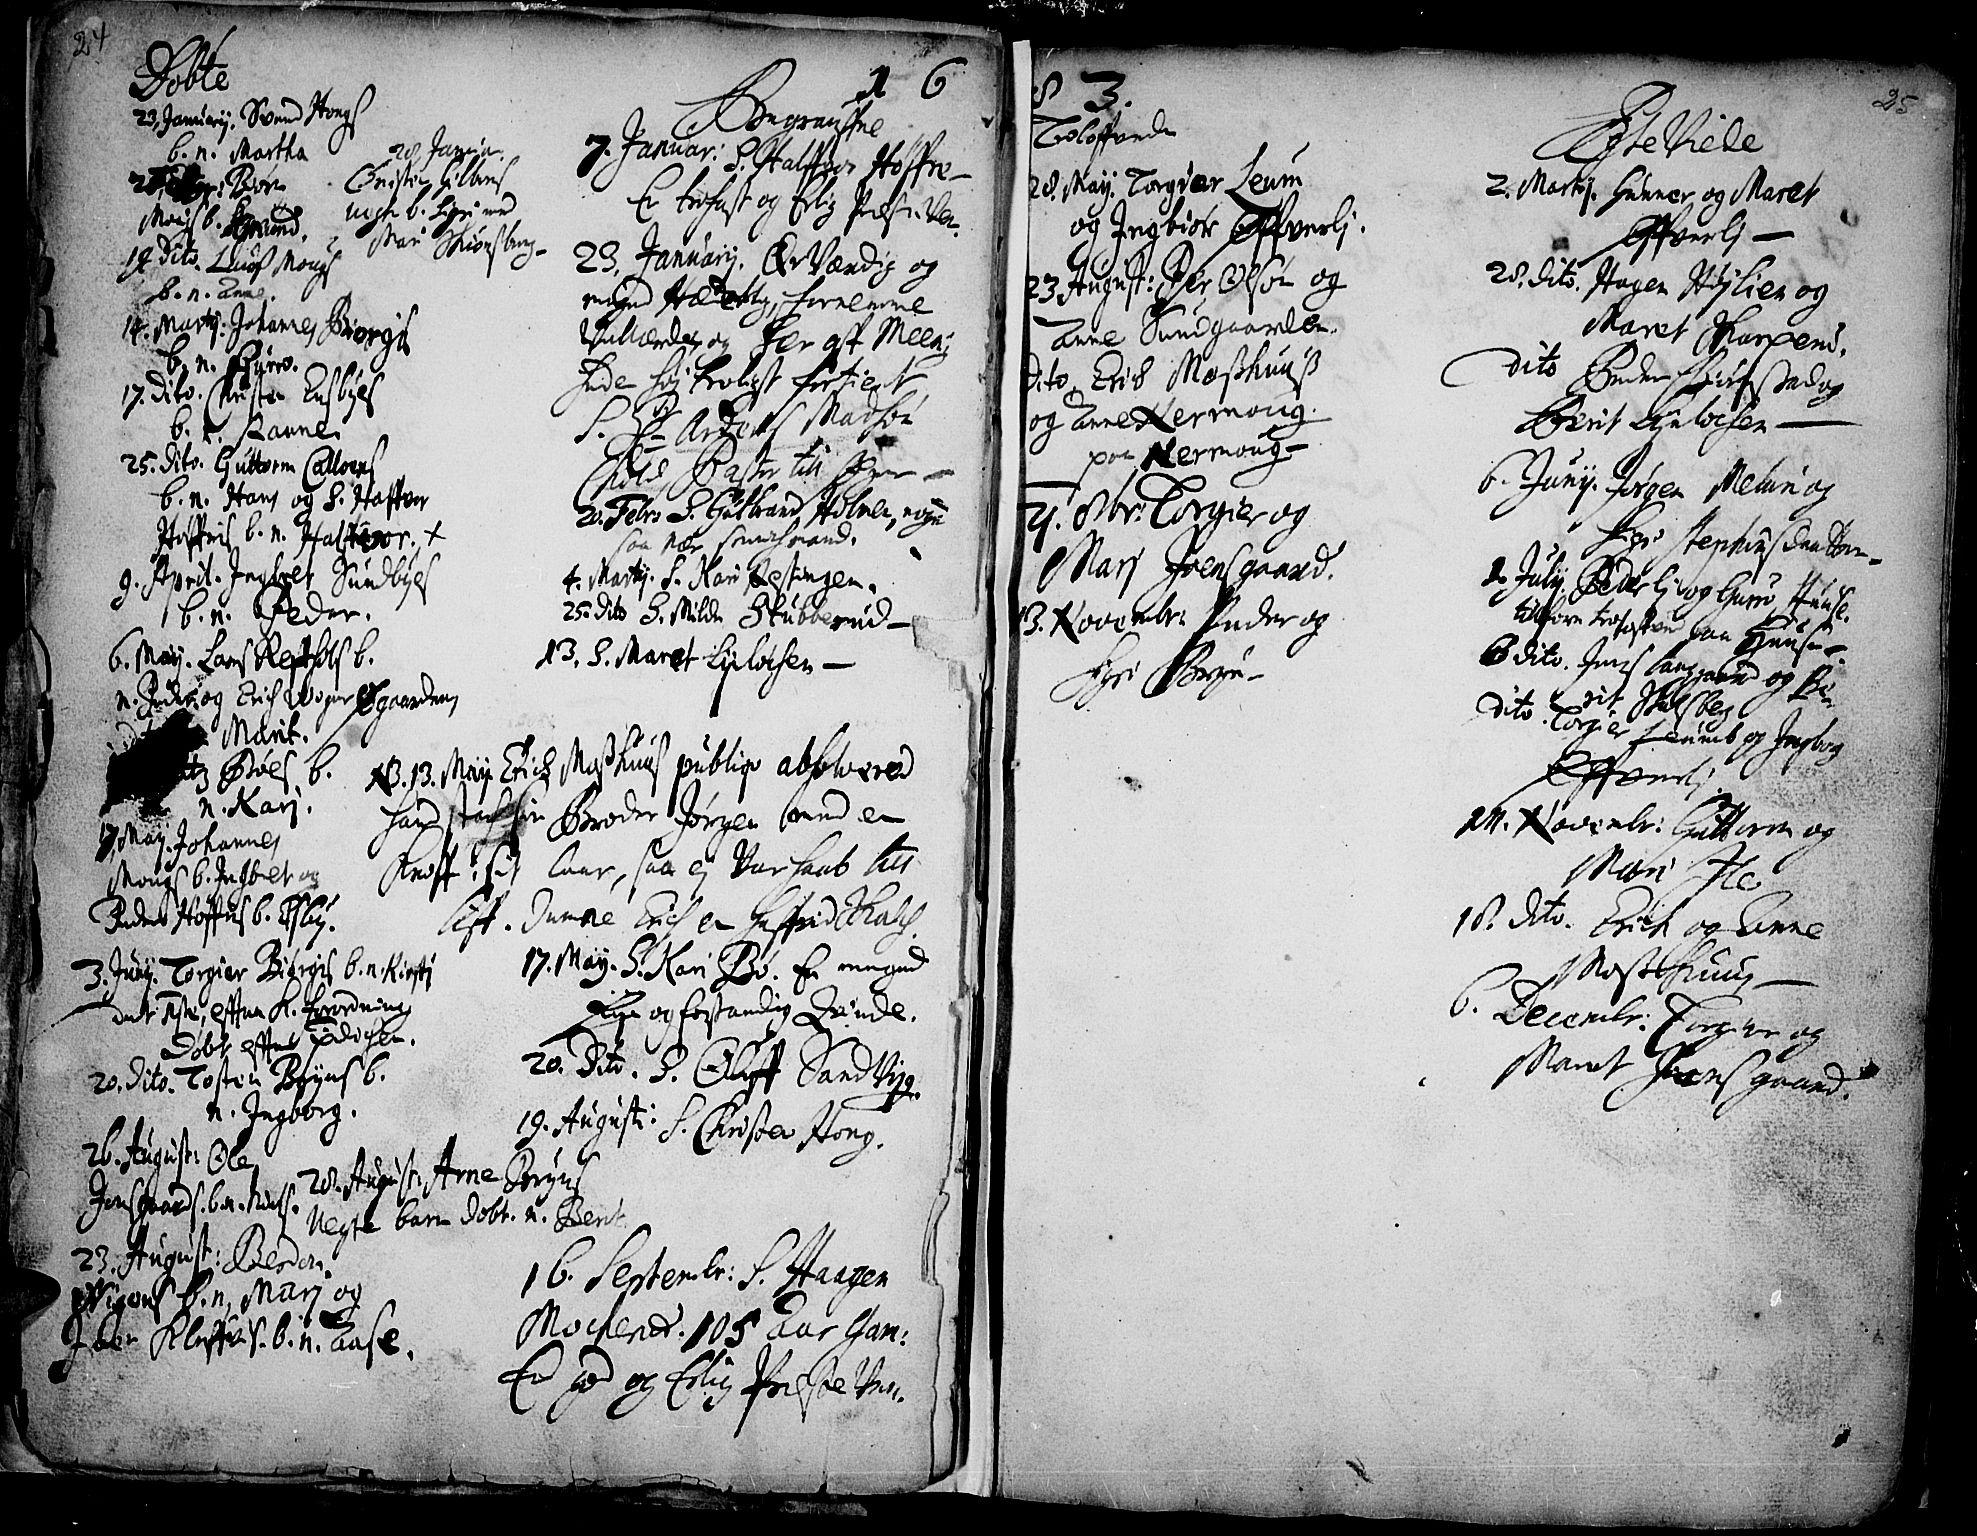 SAH, Øyer prestekontor, Ministerialbok nr. 1, 1671-1727, s. 24-25